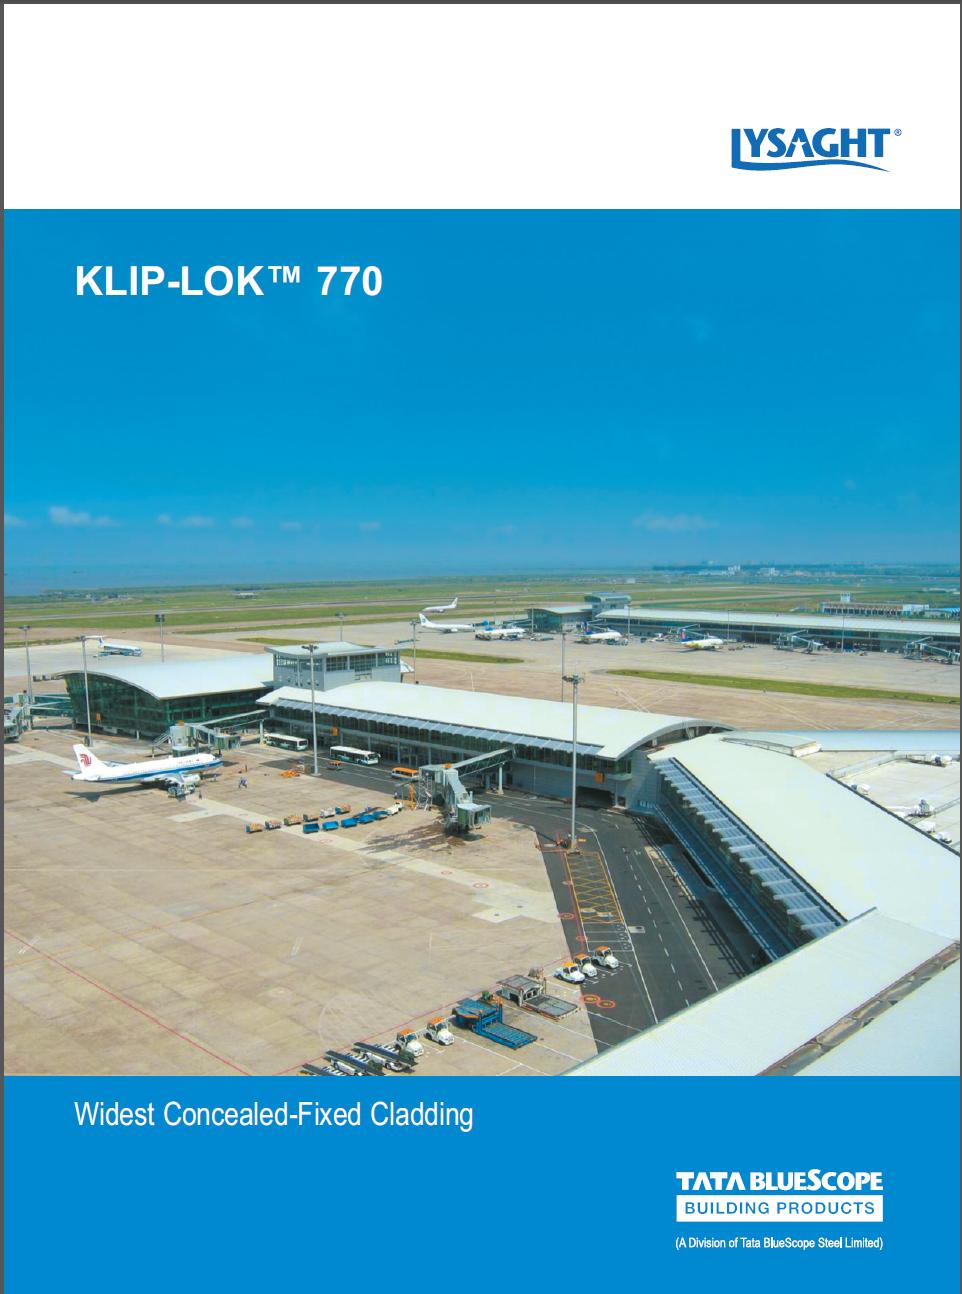 klip-lok-770_1